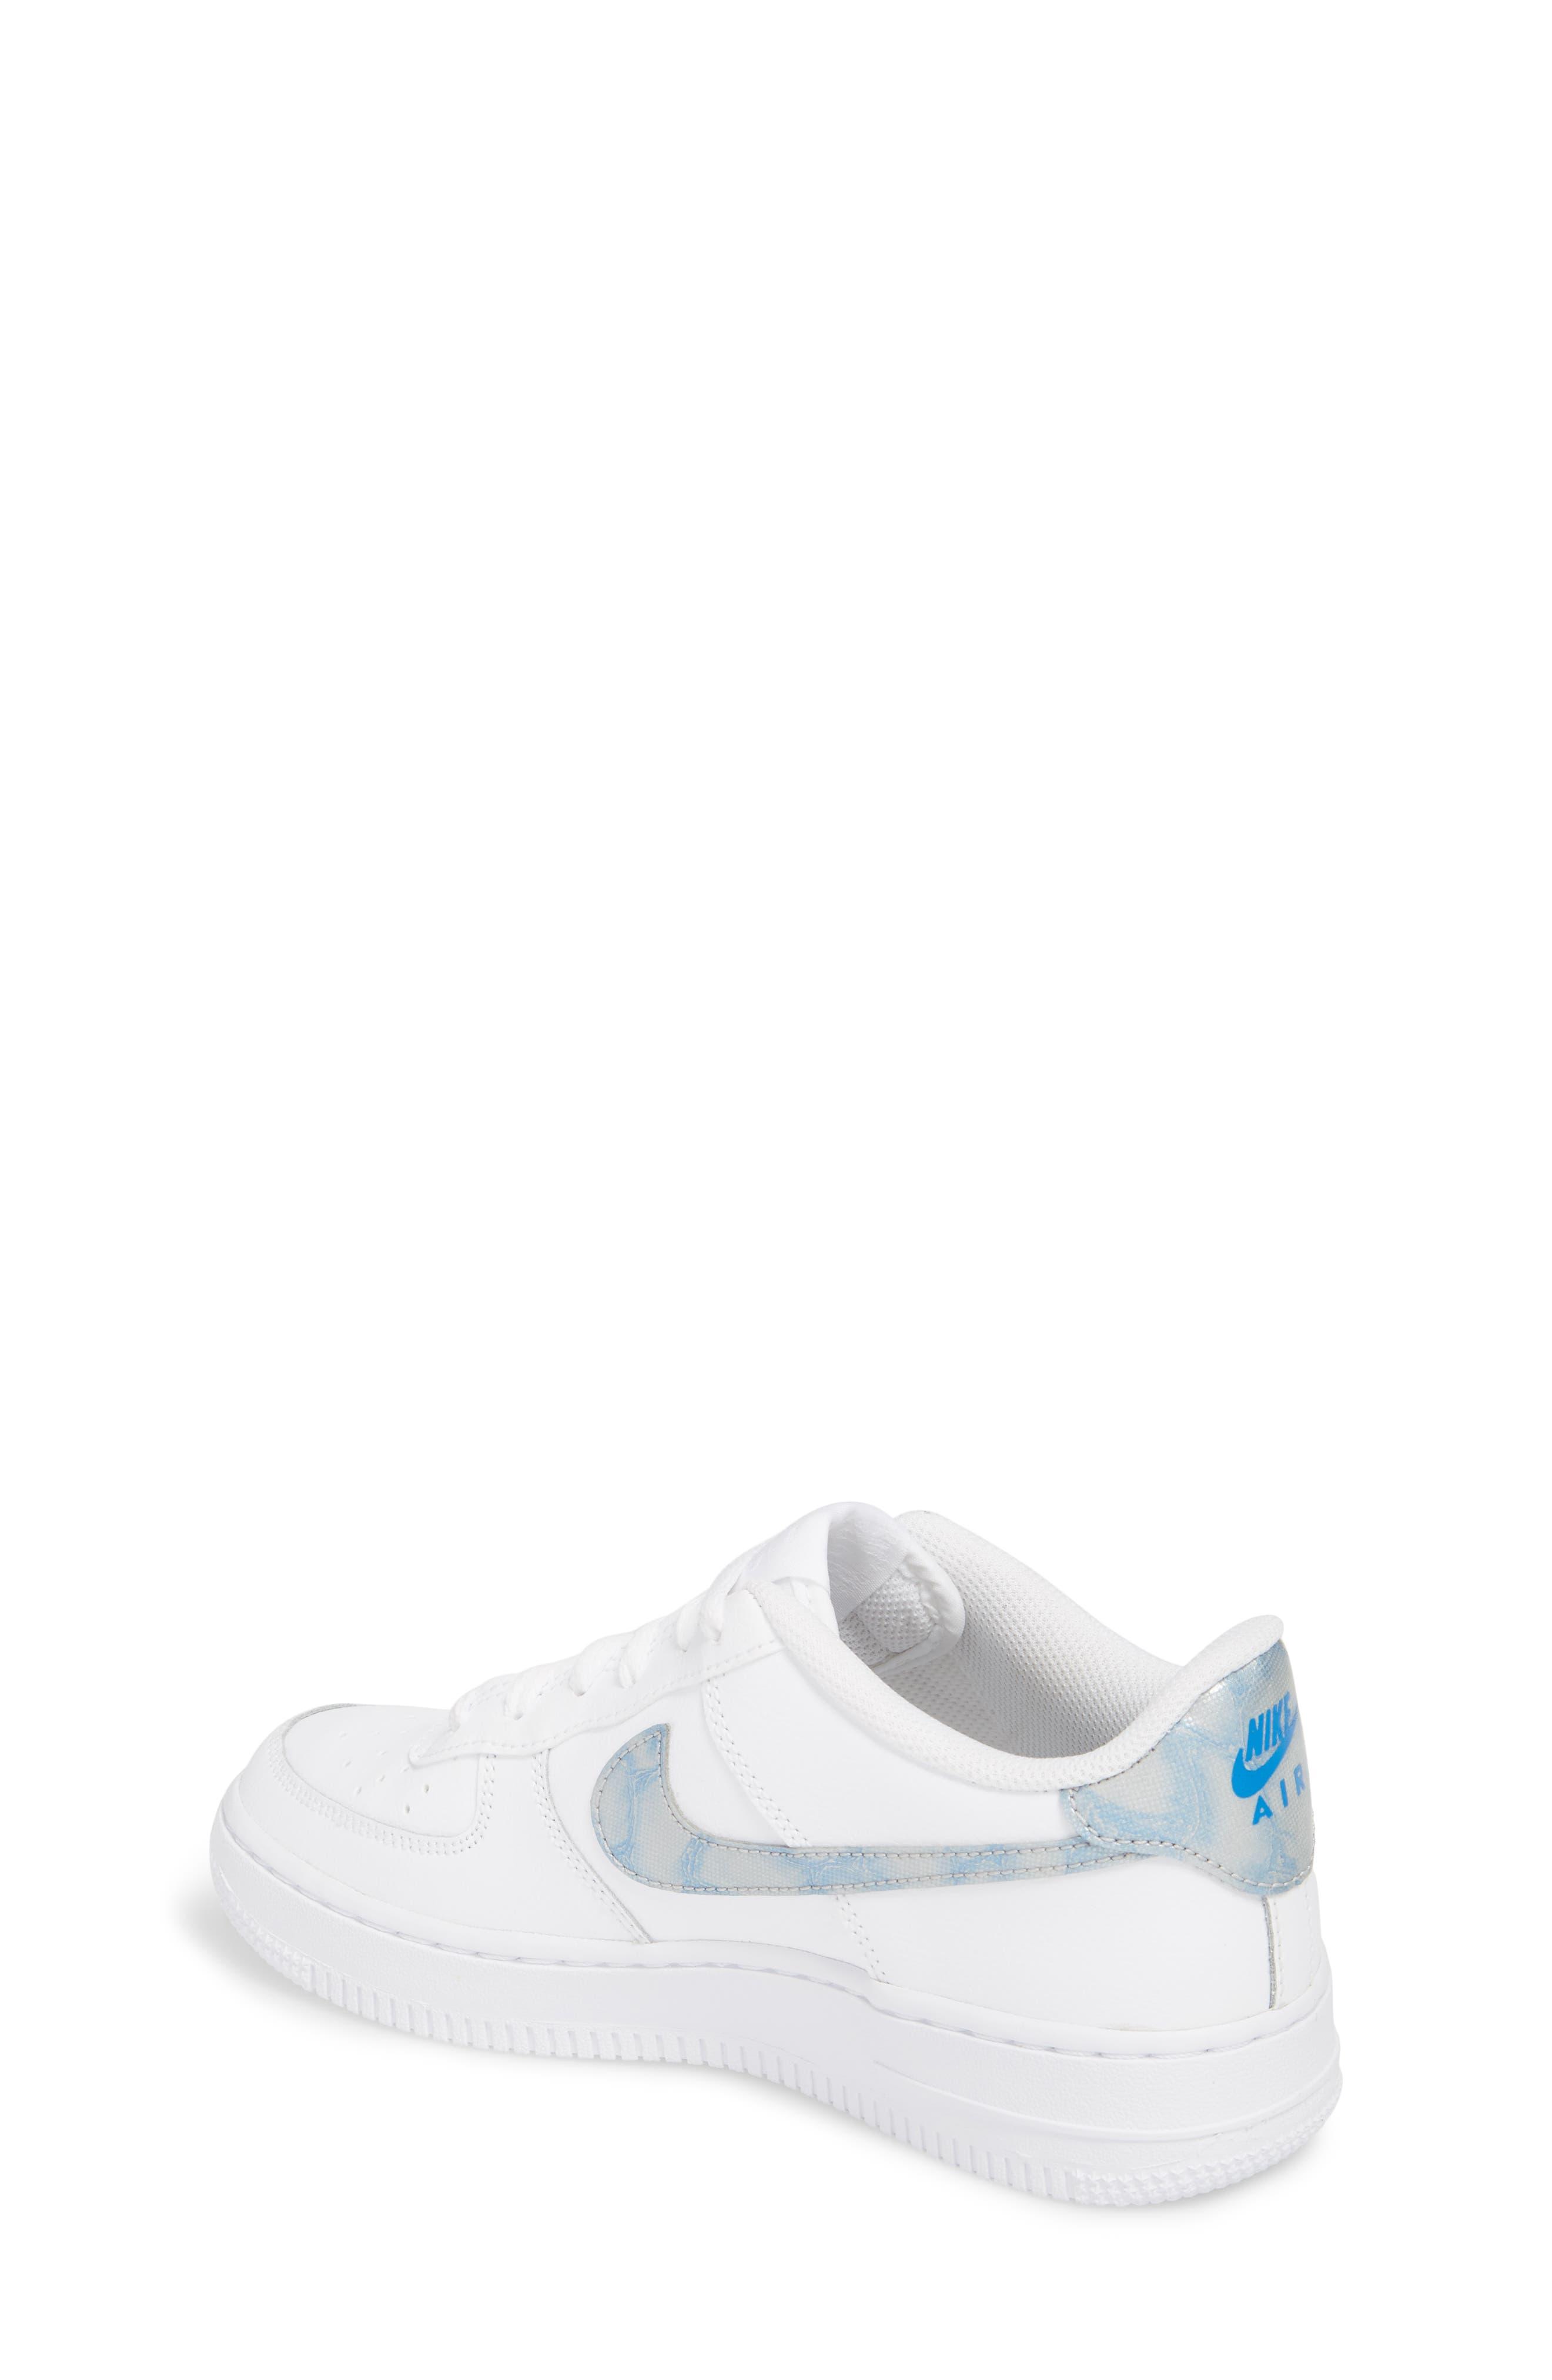 Air Force 1 '06 Sneaker,                             Alternate thumbnail 6, color,